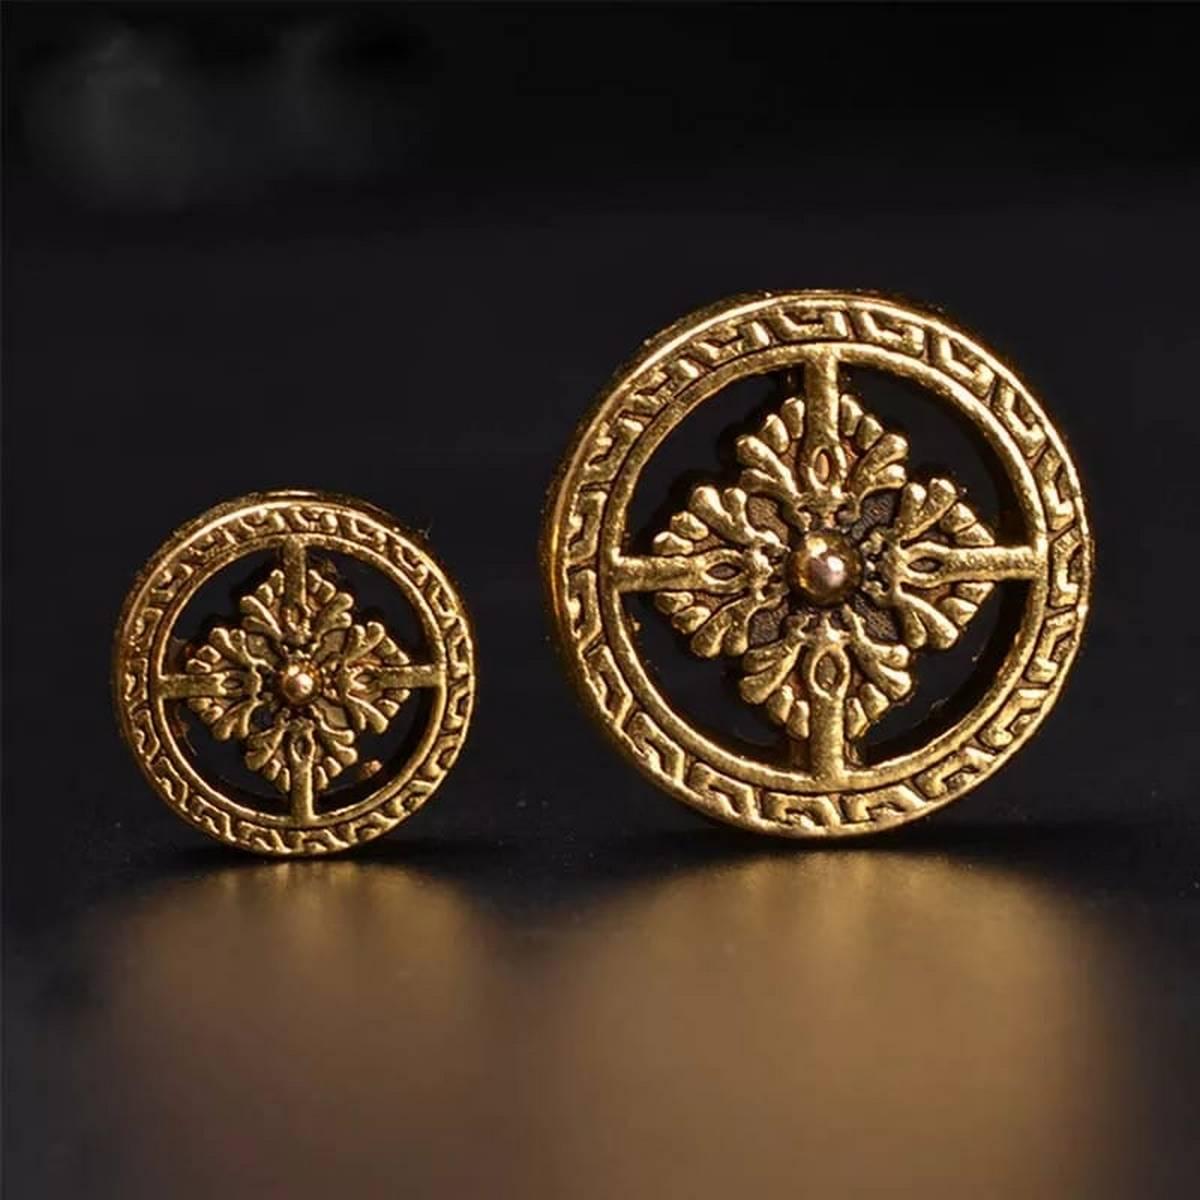 【Golden Round Wheel】5Pcs/lot Vintage Tibetan Golden Round Wheel Beads 18x5mm Flat Metal Buddha Spacer Beads DIY Jewelry Making Decoration Findings Dabu Collection